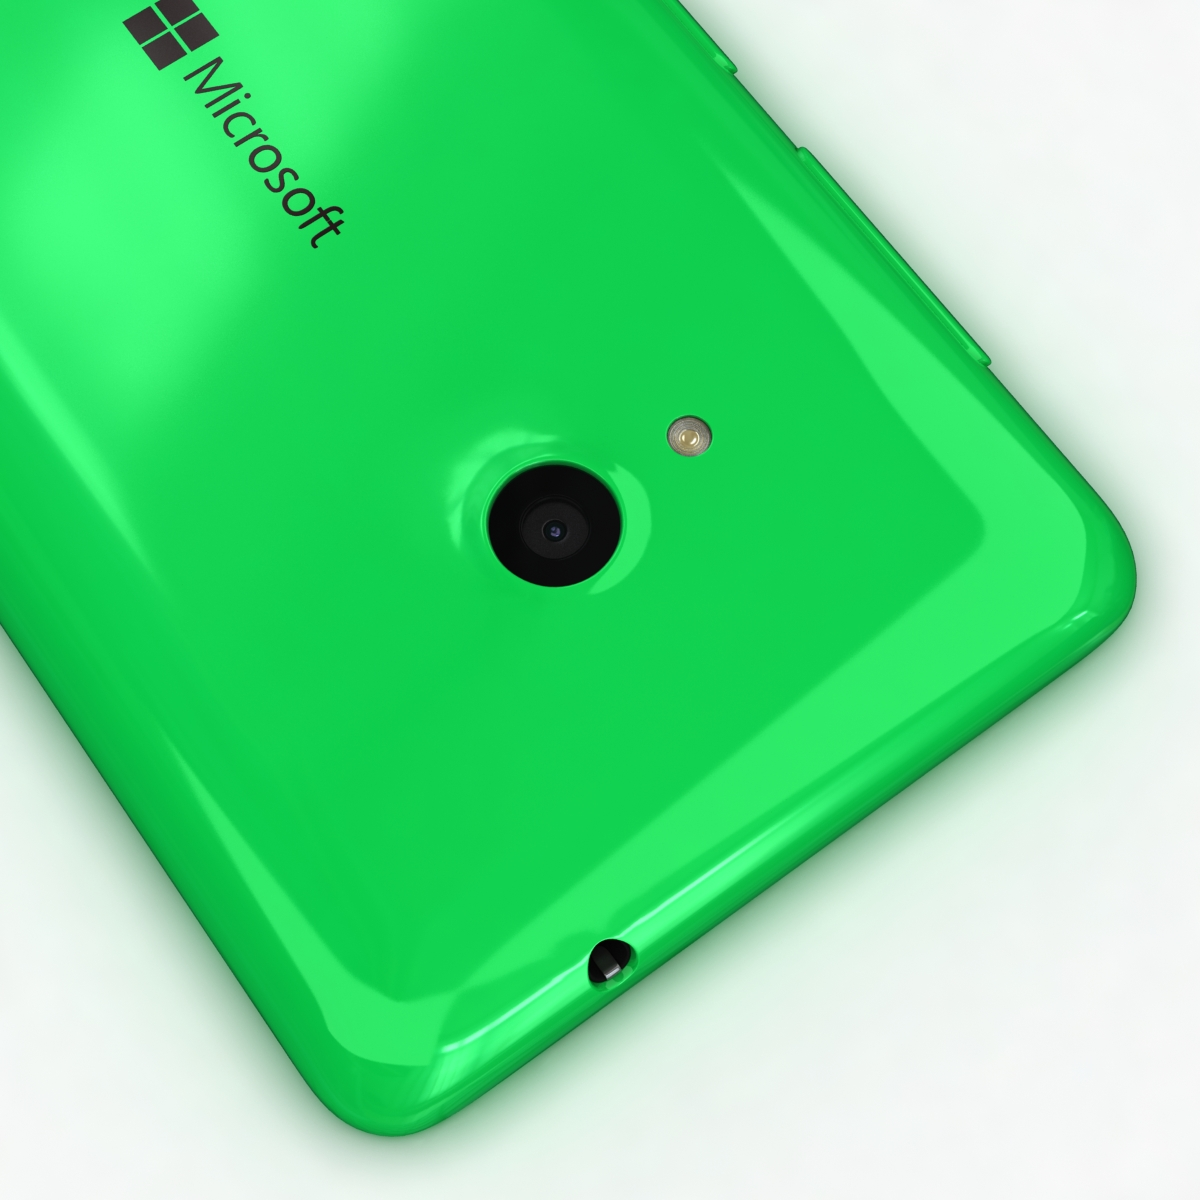 microsoft lumia 535 and dual sim green 3d model 3ds max fbx c4d obj 204176